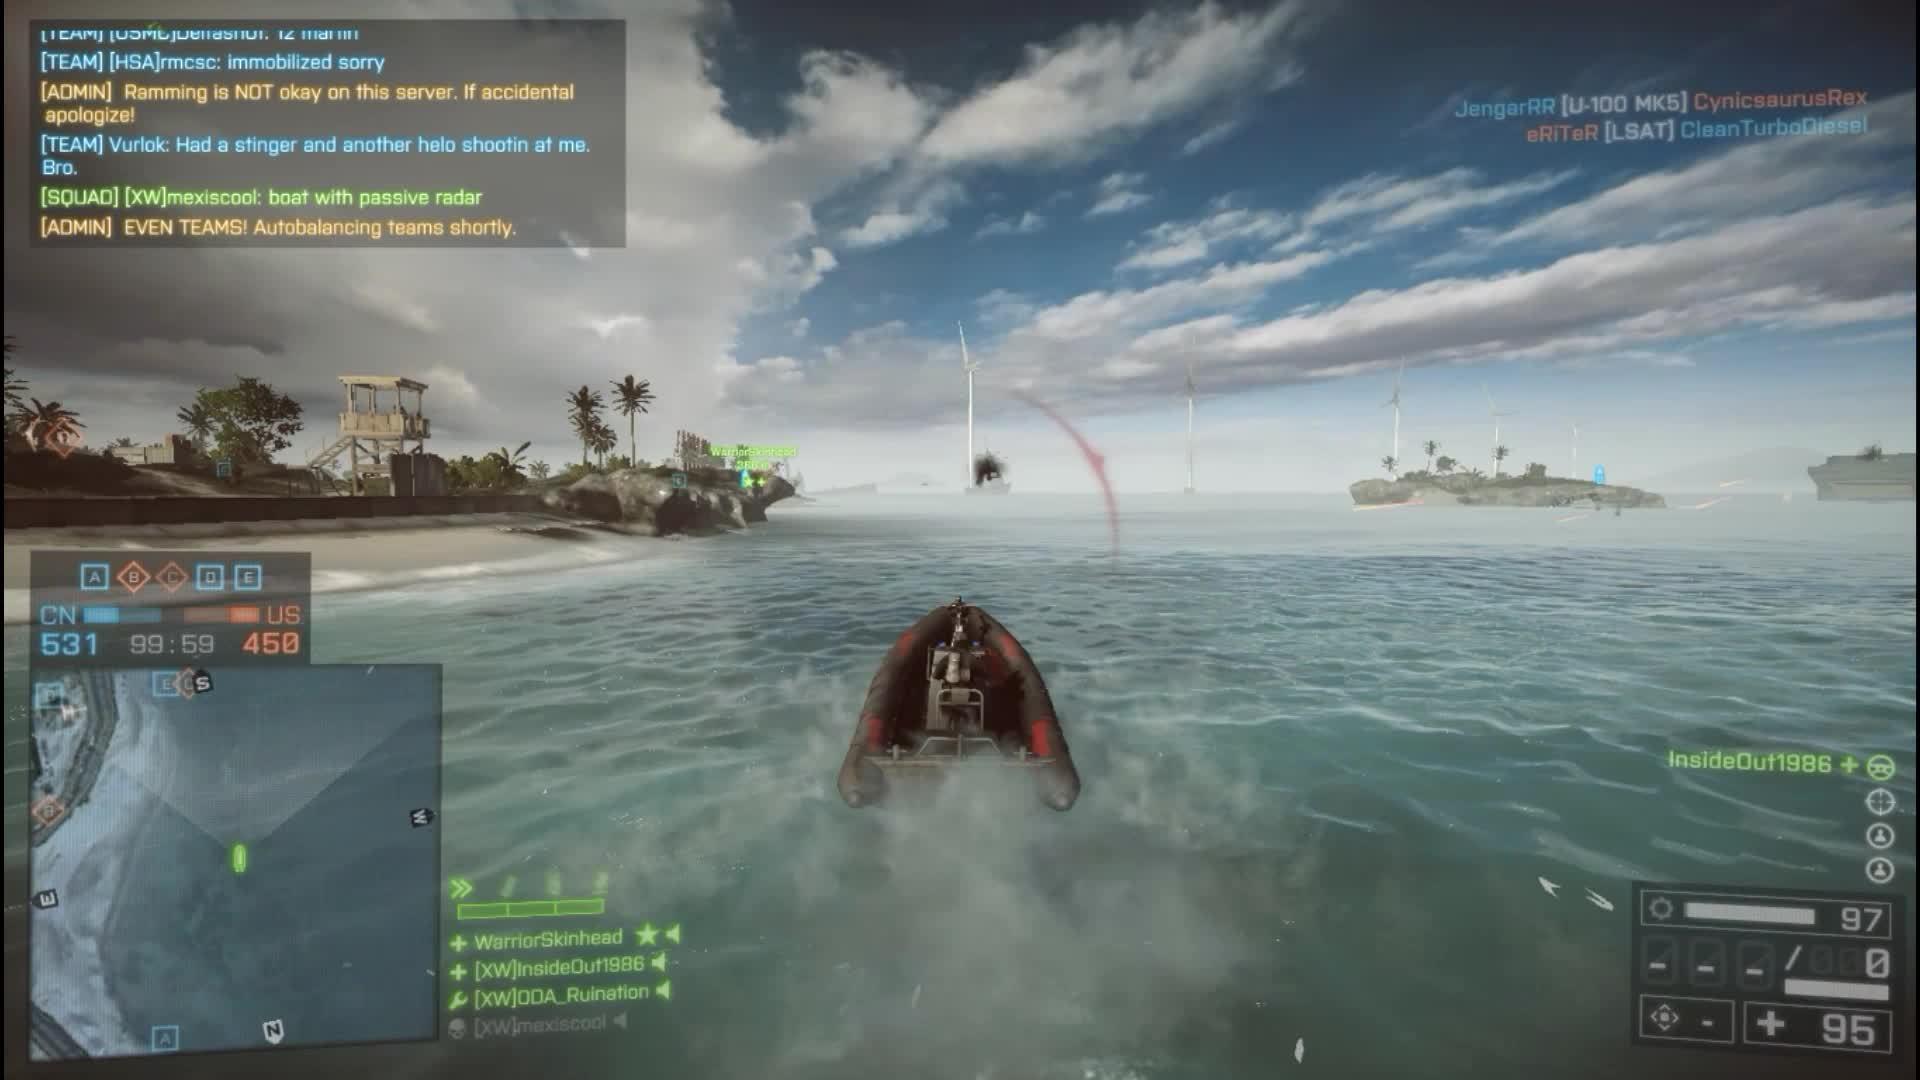 battlefield_4, A new type of Megalodon? (OC) (reddit) GIFs